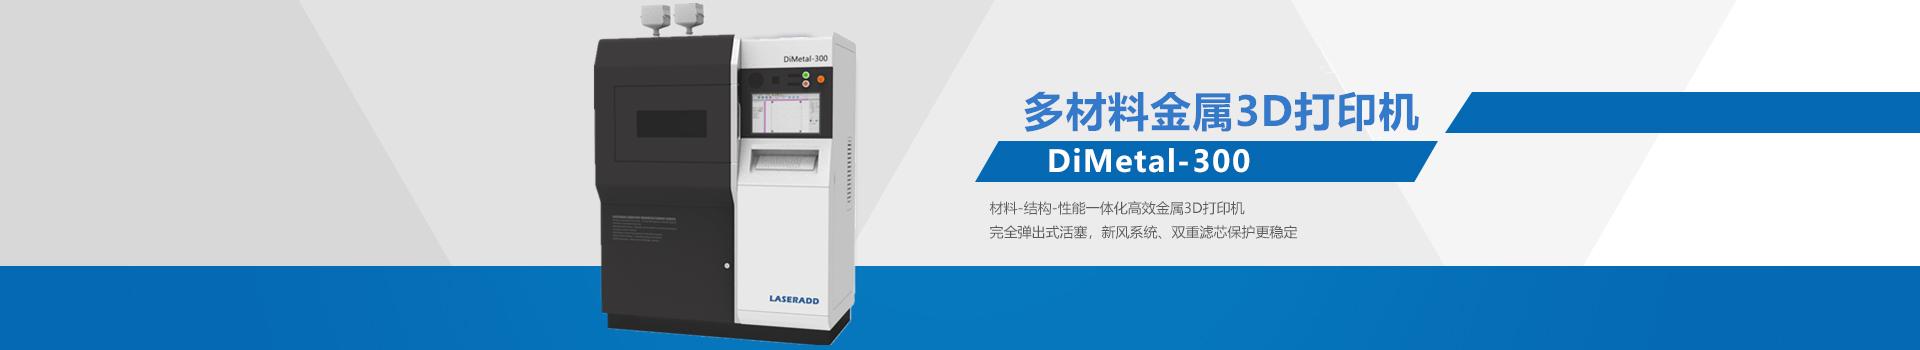 DiMetal-300 多材料金屬3D打印機